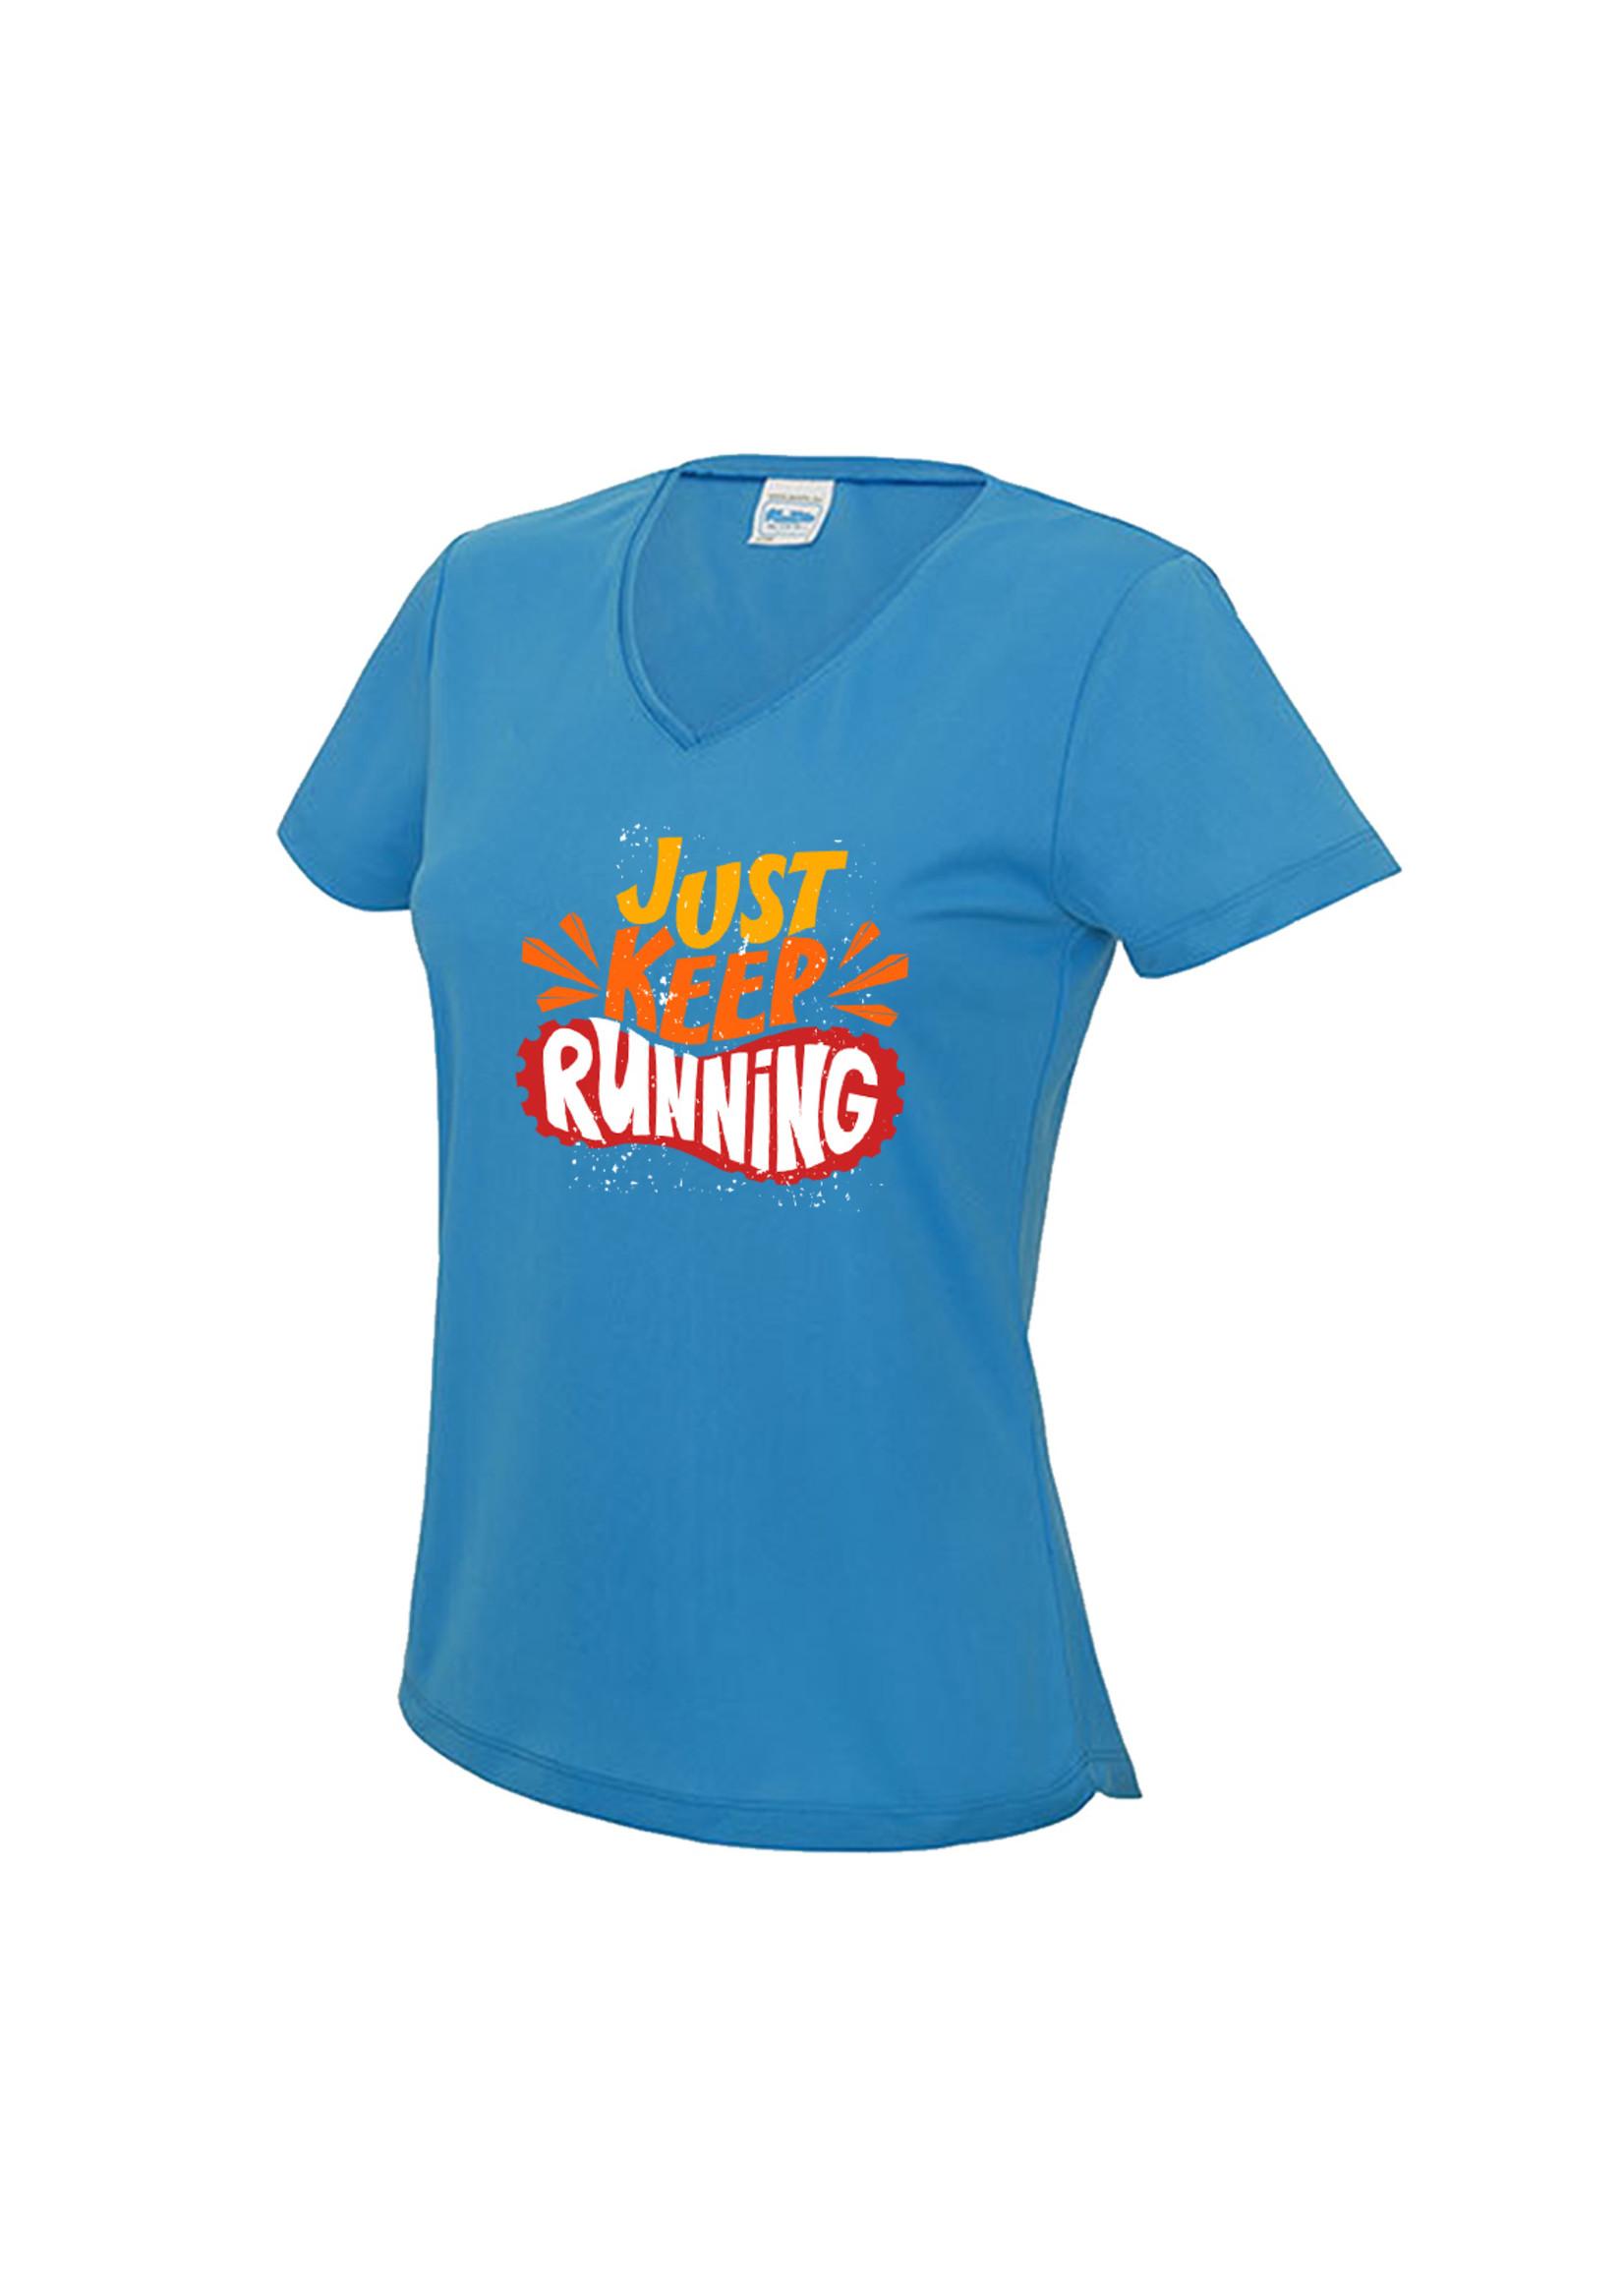 Hardloopshirt met v-hals - Just keep running